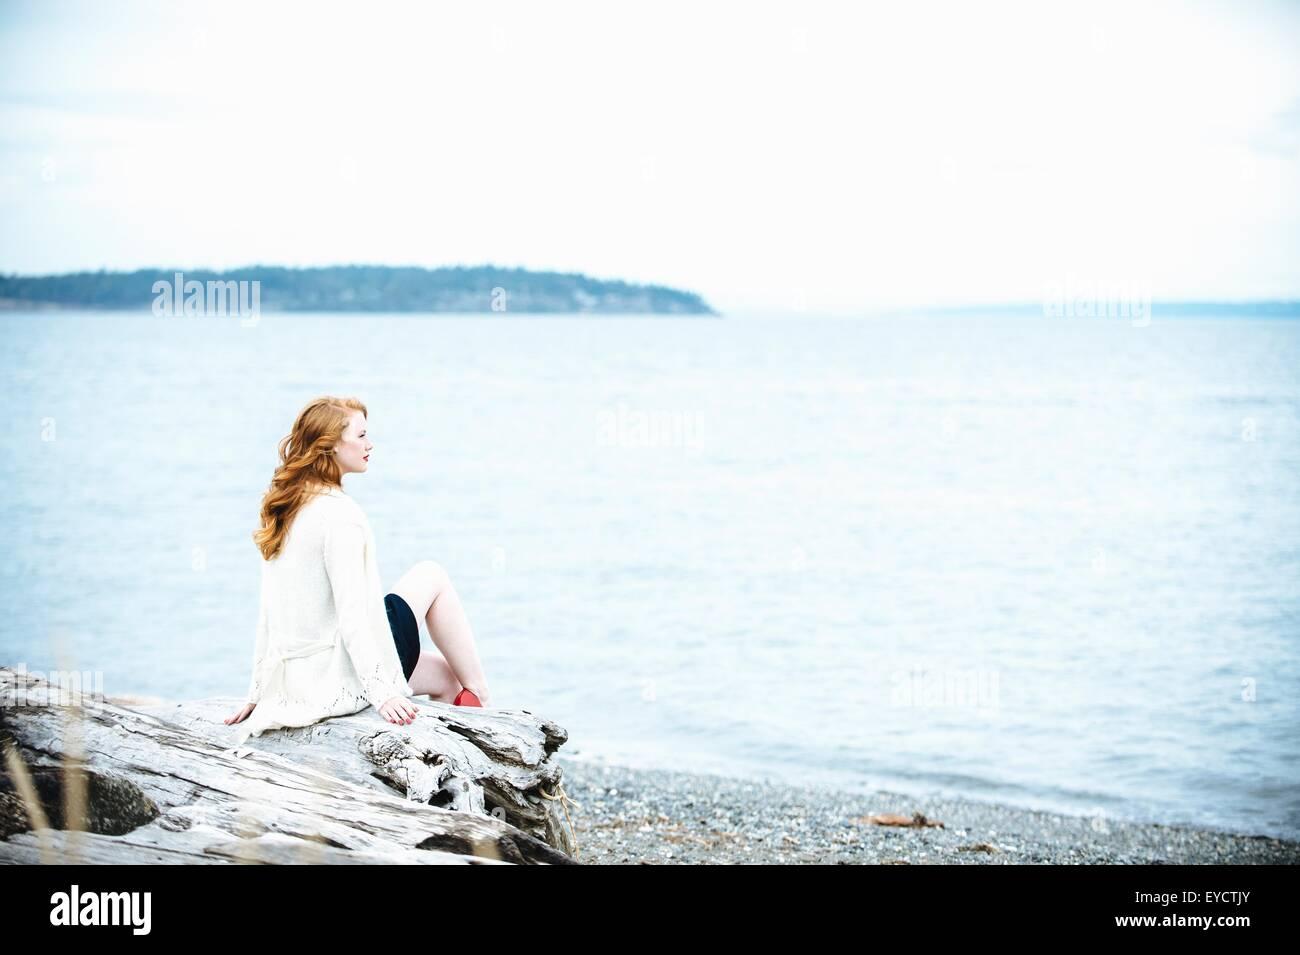 Young woman sitting on beach looking out to sea, Bainbridge Island, Washington State, USA - Stock Image